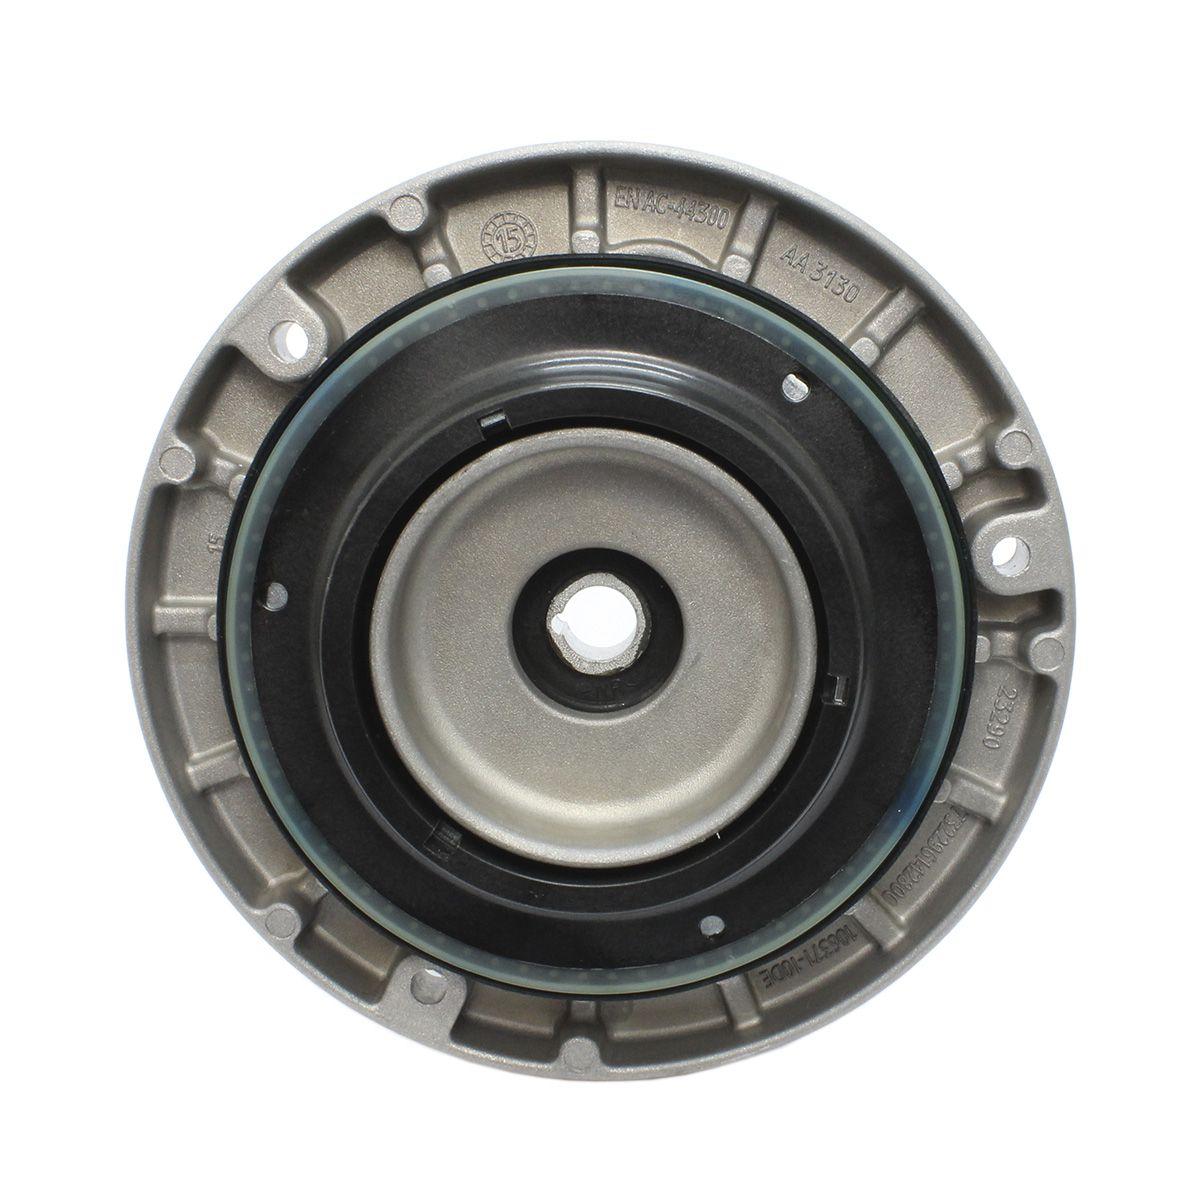 Coxim do Batente Superior Bmw X3 F25 09 - 17 X4 F26 13 / 17 - 31306852158